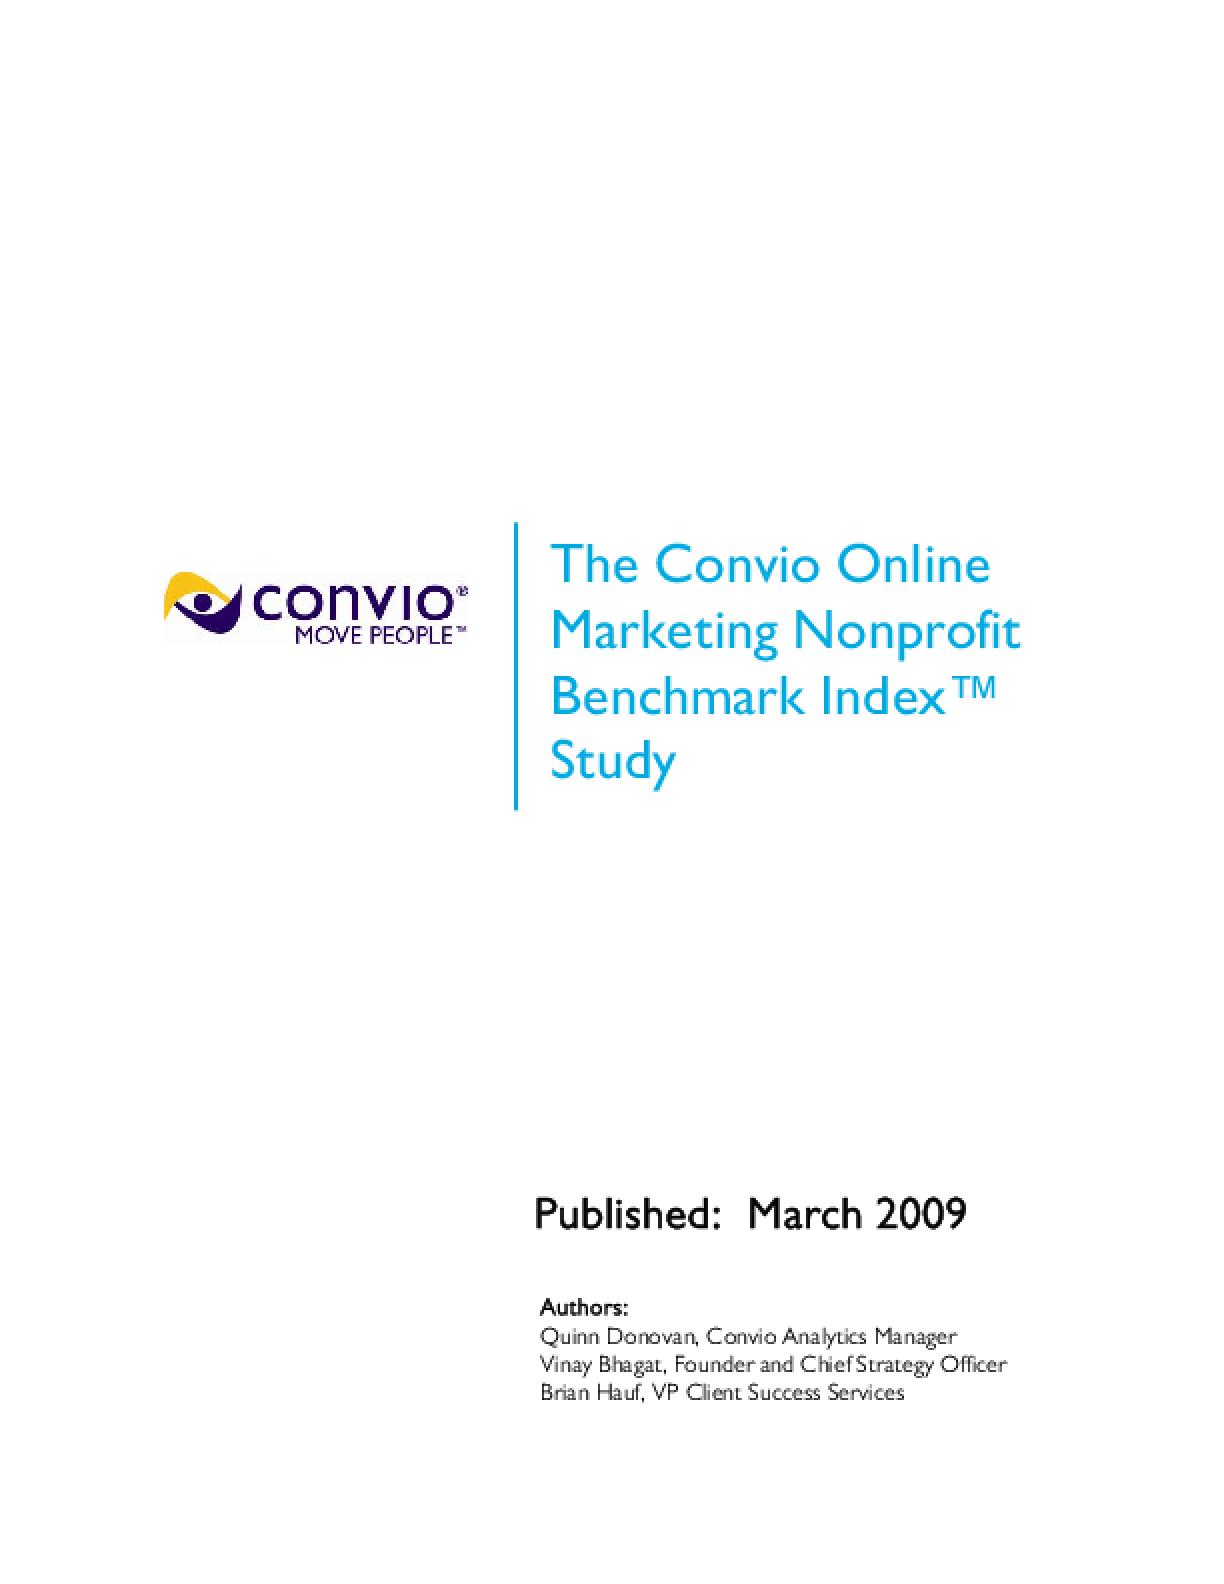 The Convio Online Marketing Nonprofit Benchmark Index Study